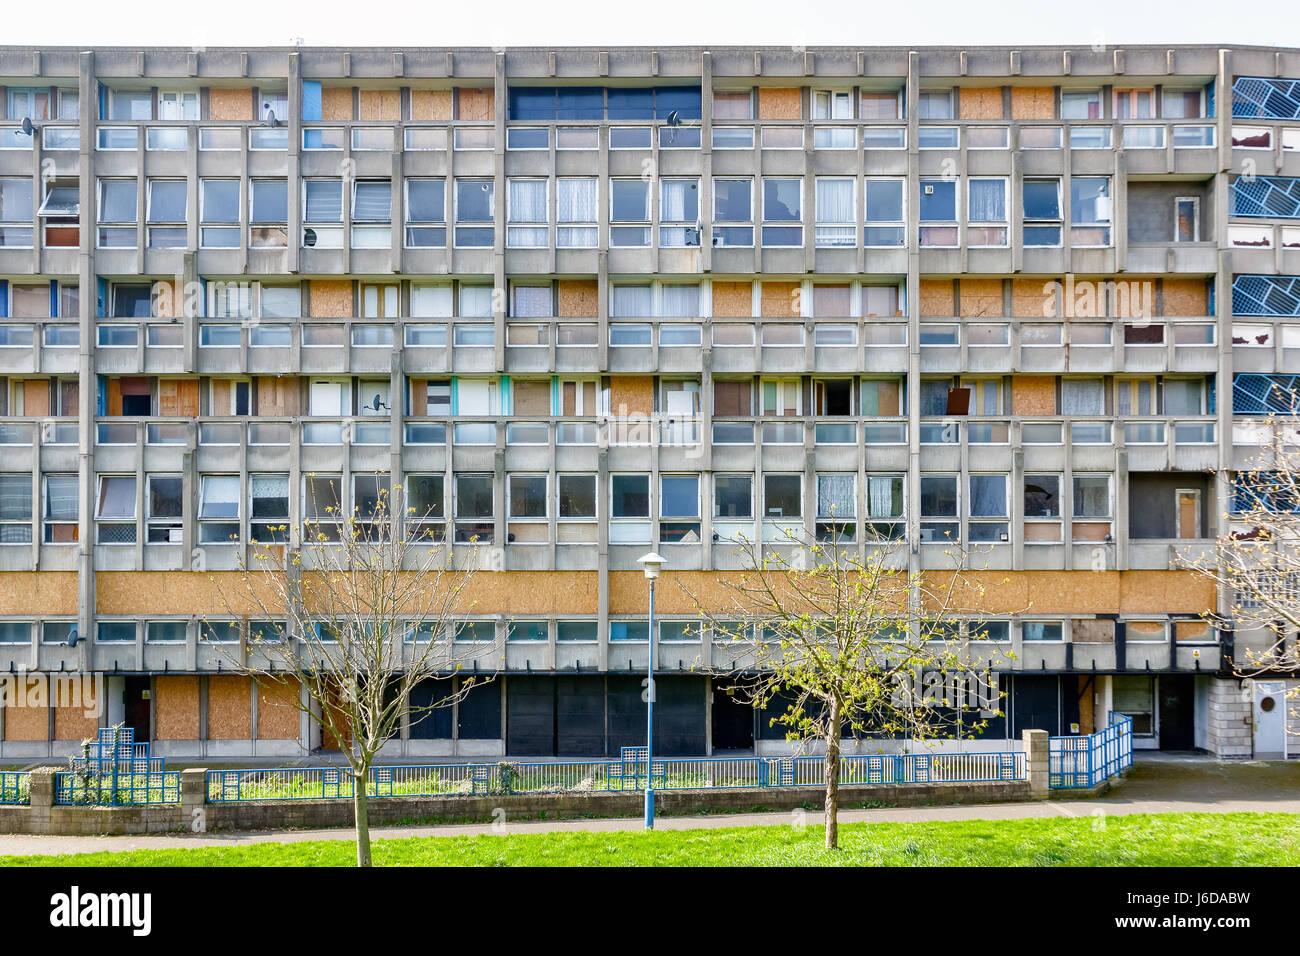 Dilapidated council flat housing block, Robin Hood Gardens, in East London Stock Photo